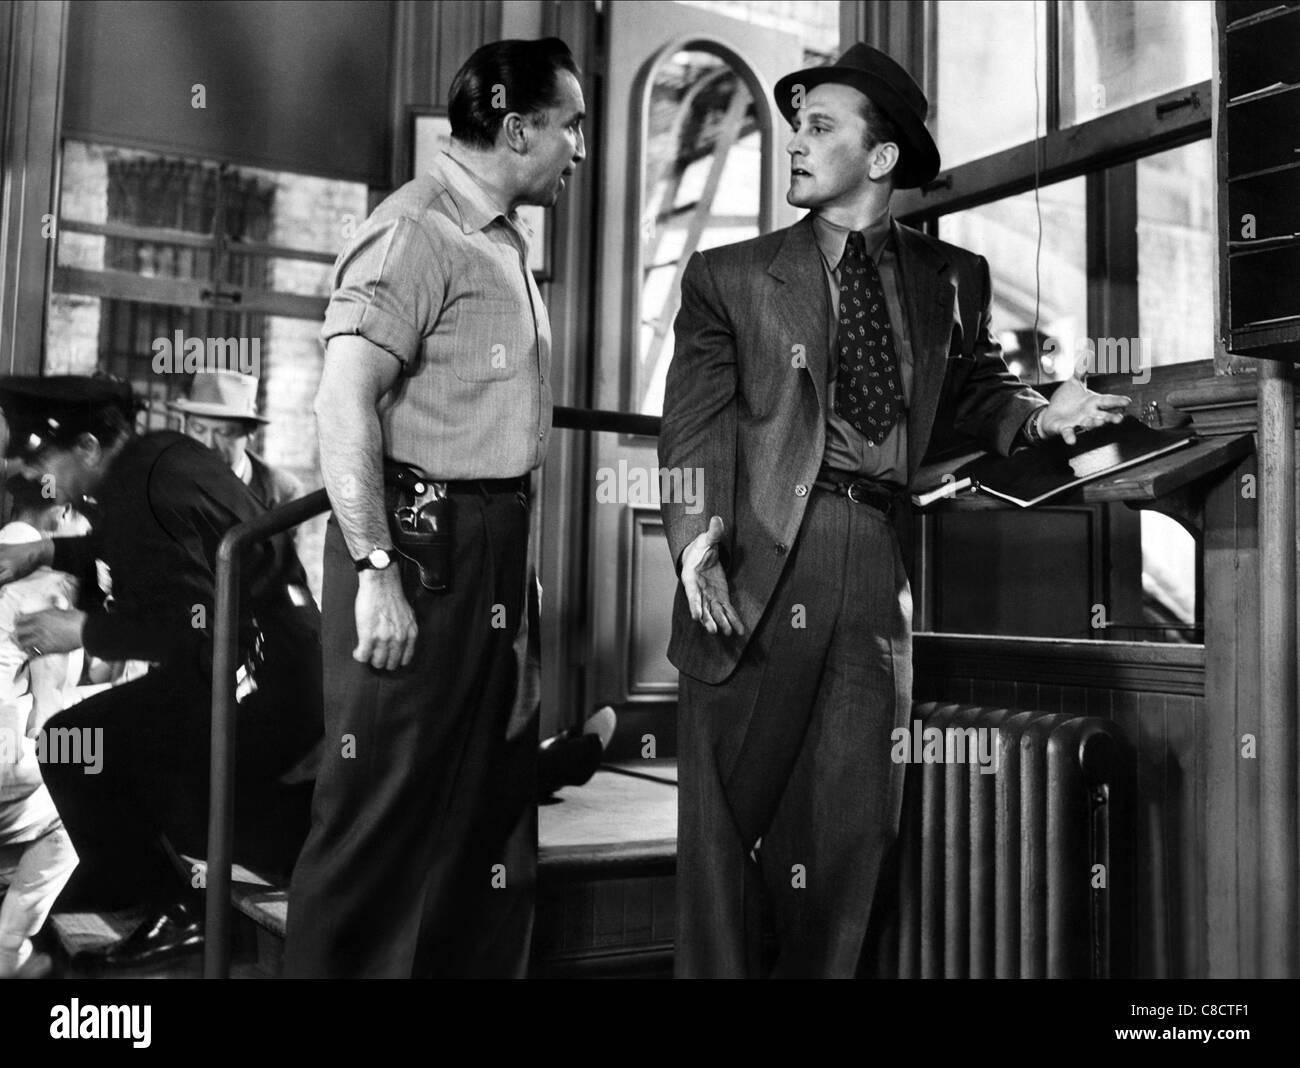 HORACE MCMAHON, KIRK DOUGLAS, DETECTIVE STORY, 1951 - Stock Image